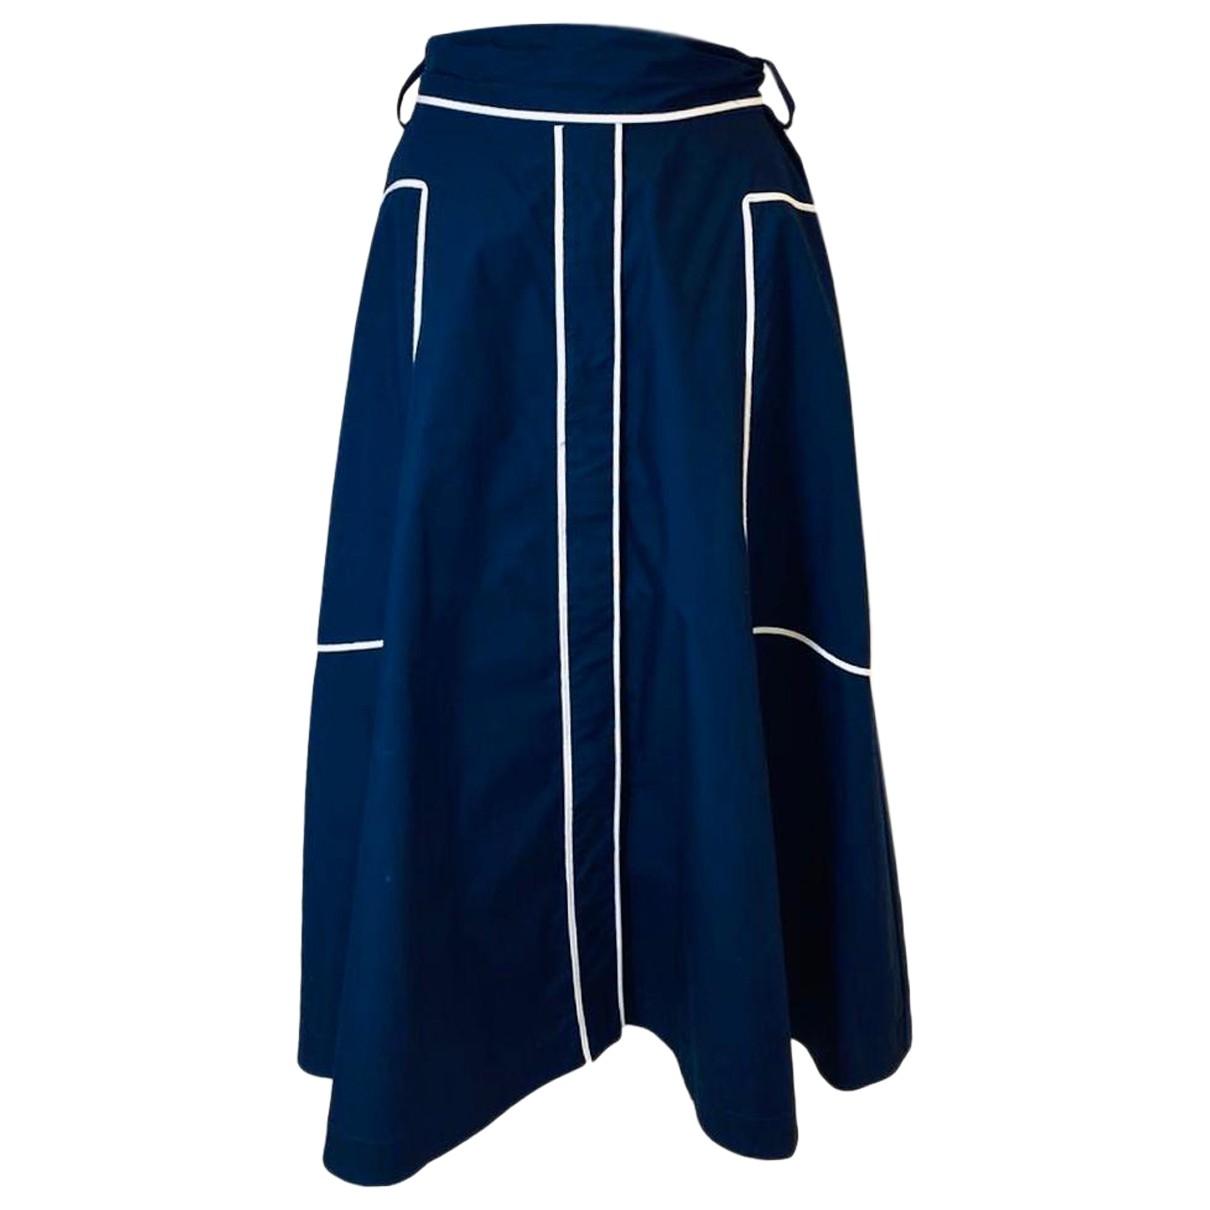 Carolina Herrera \N Navy Cotton skirt for Women M International